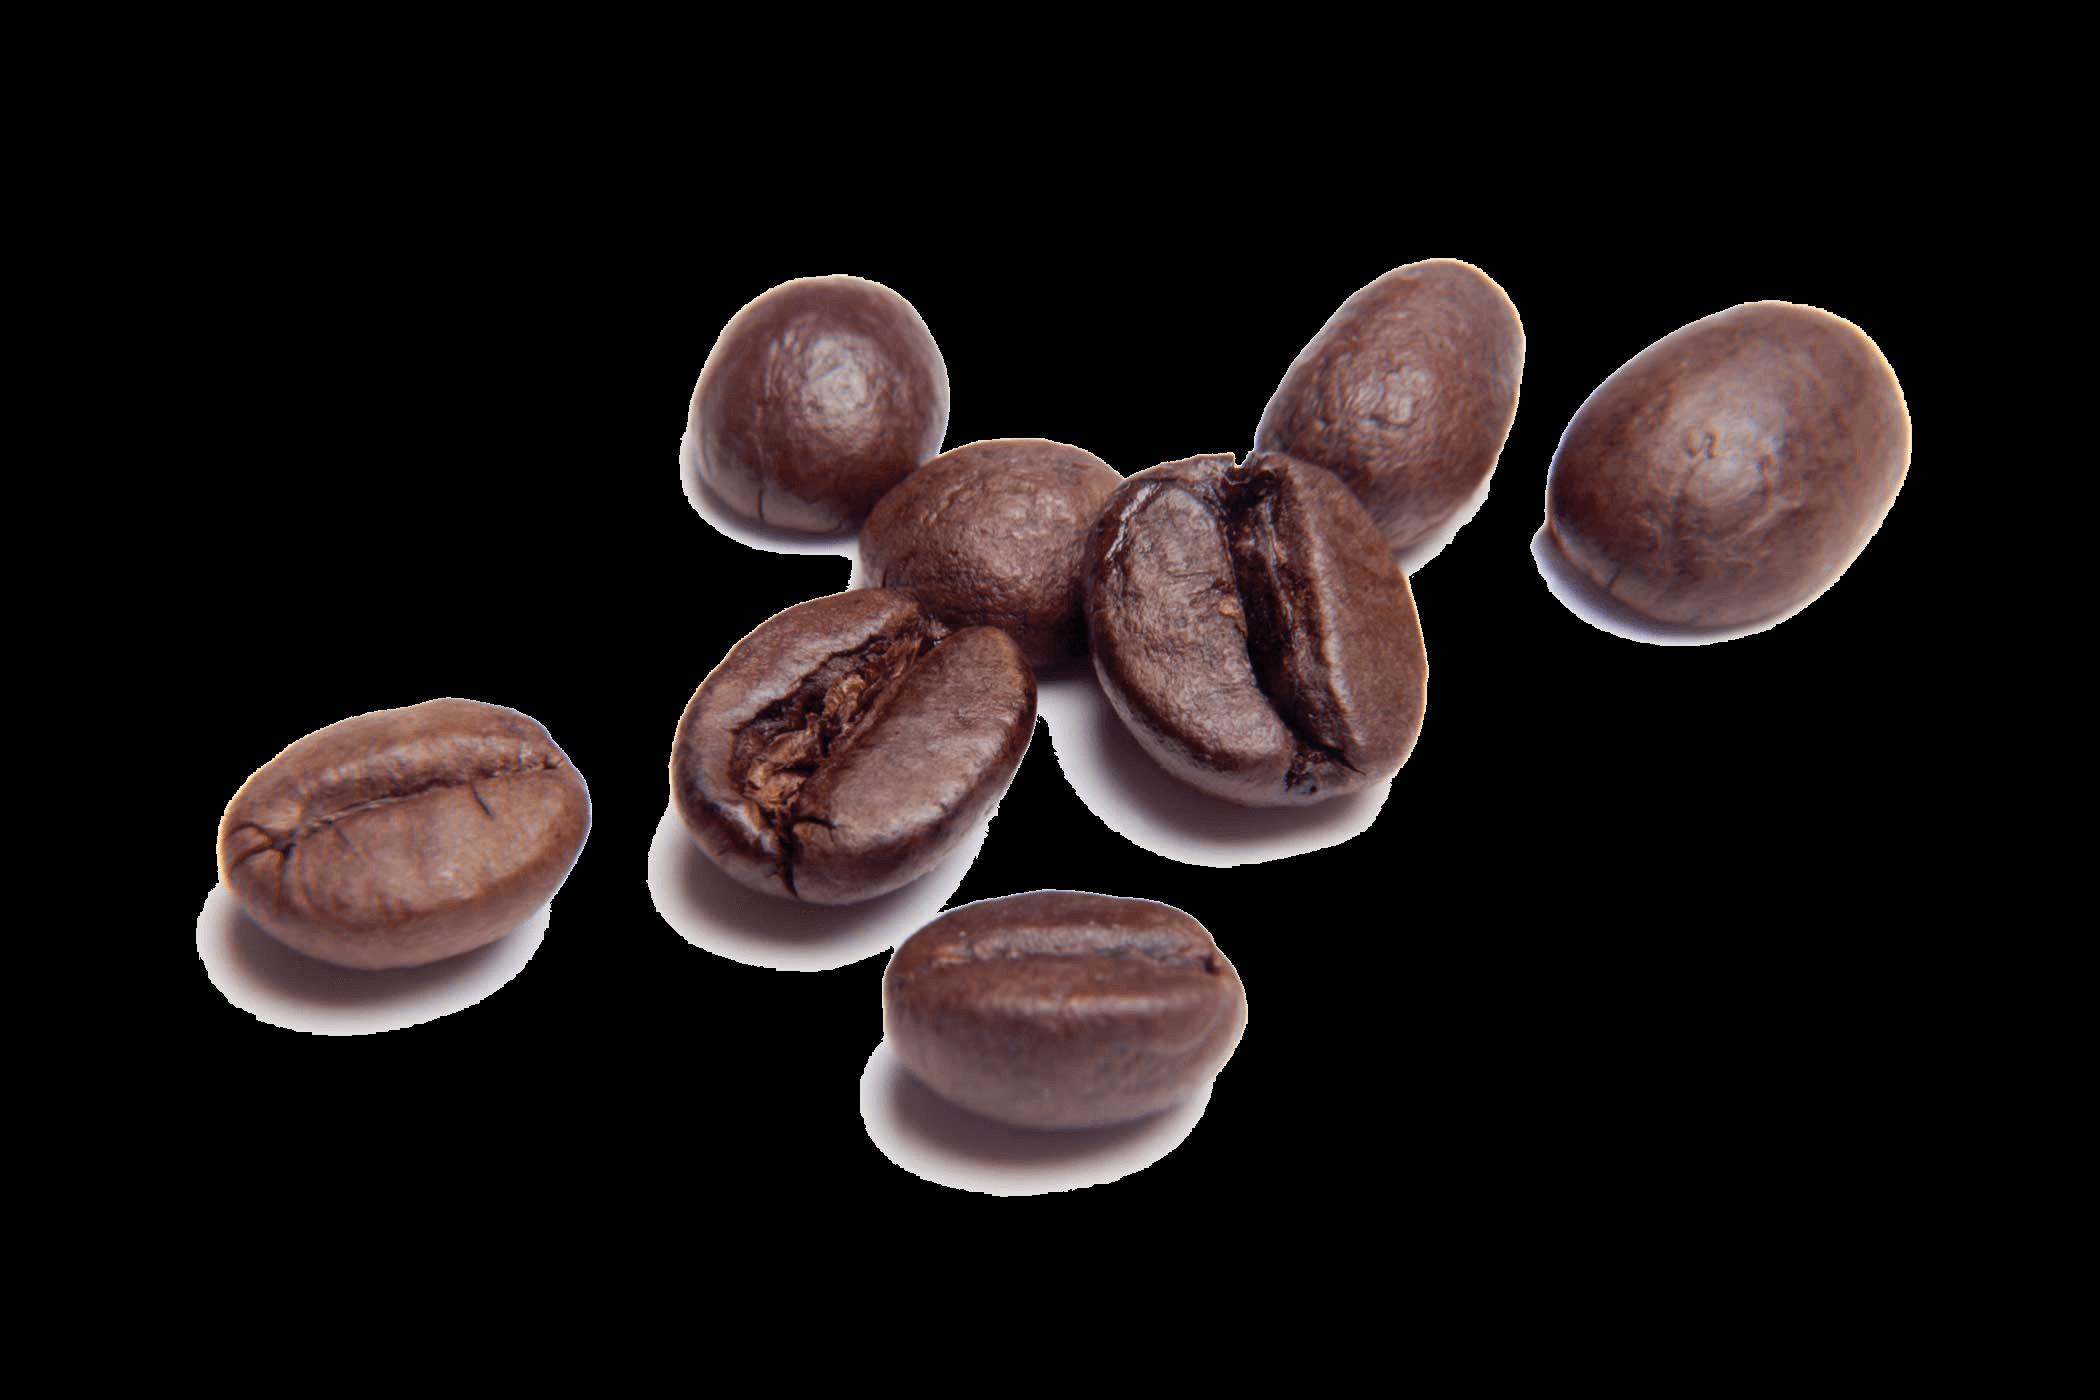 Grains clipart bean. Png coffee beans transparent